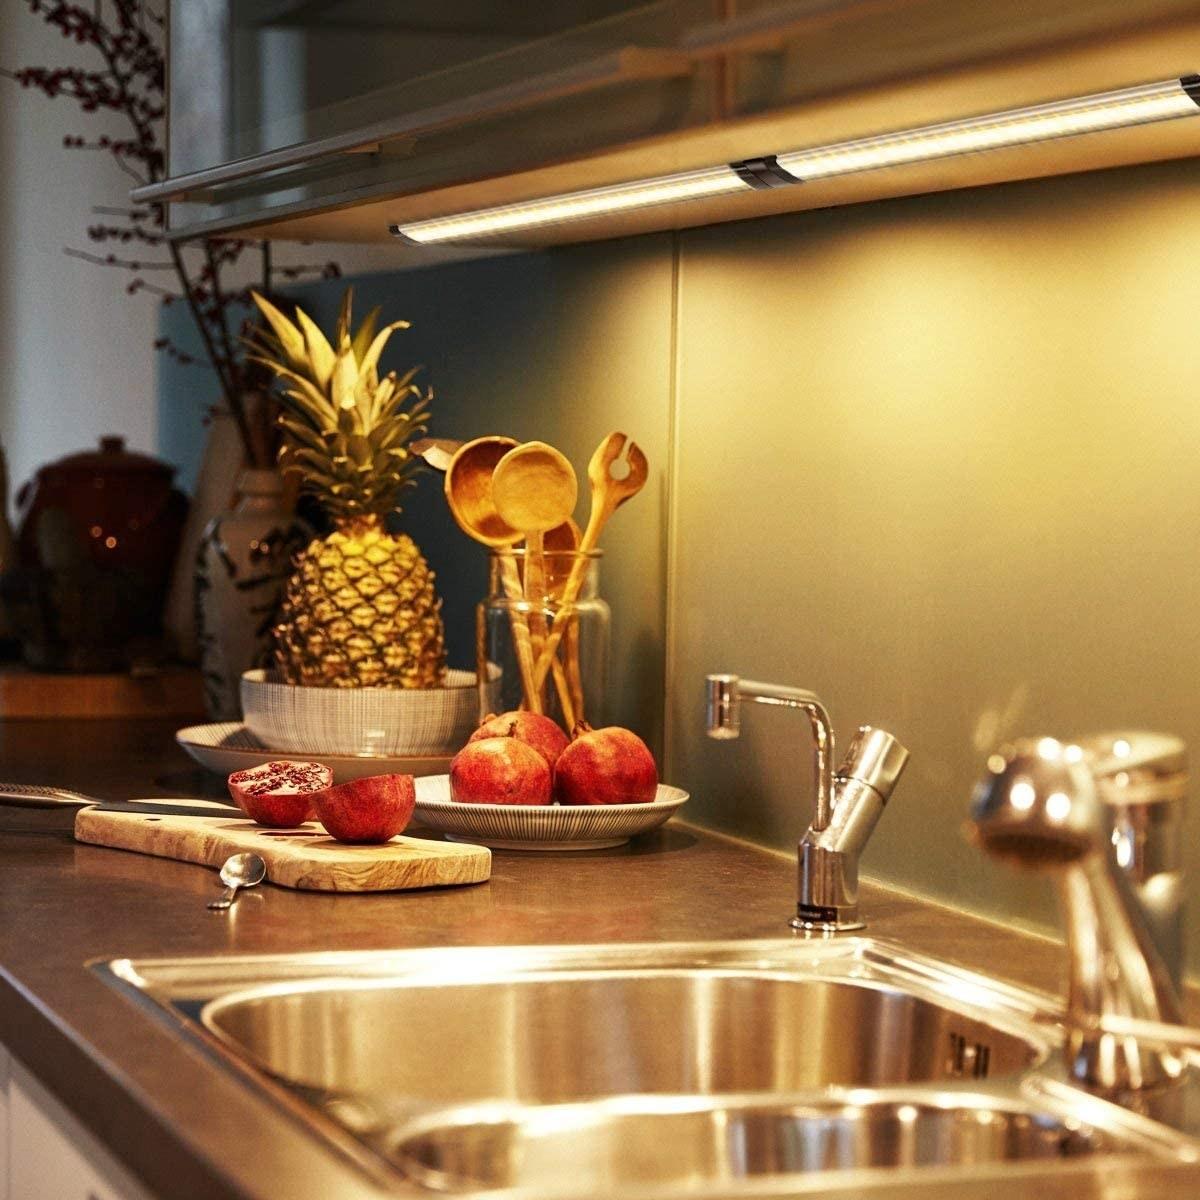 Strip lights on cabinet brightening a kitchen counter top